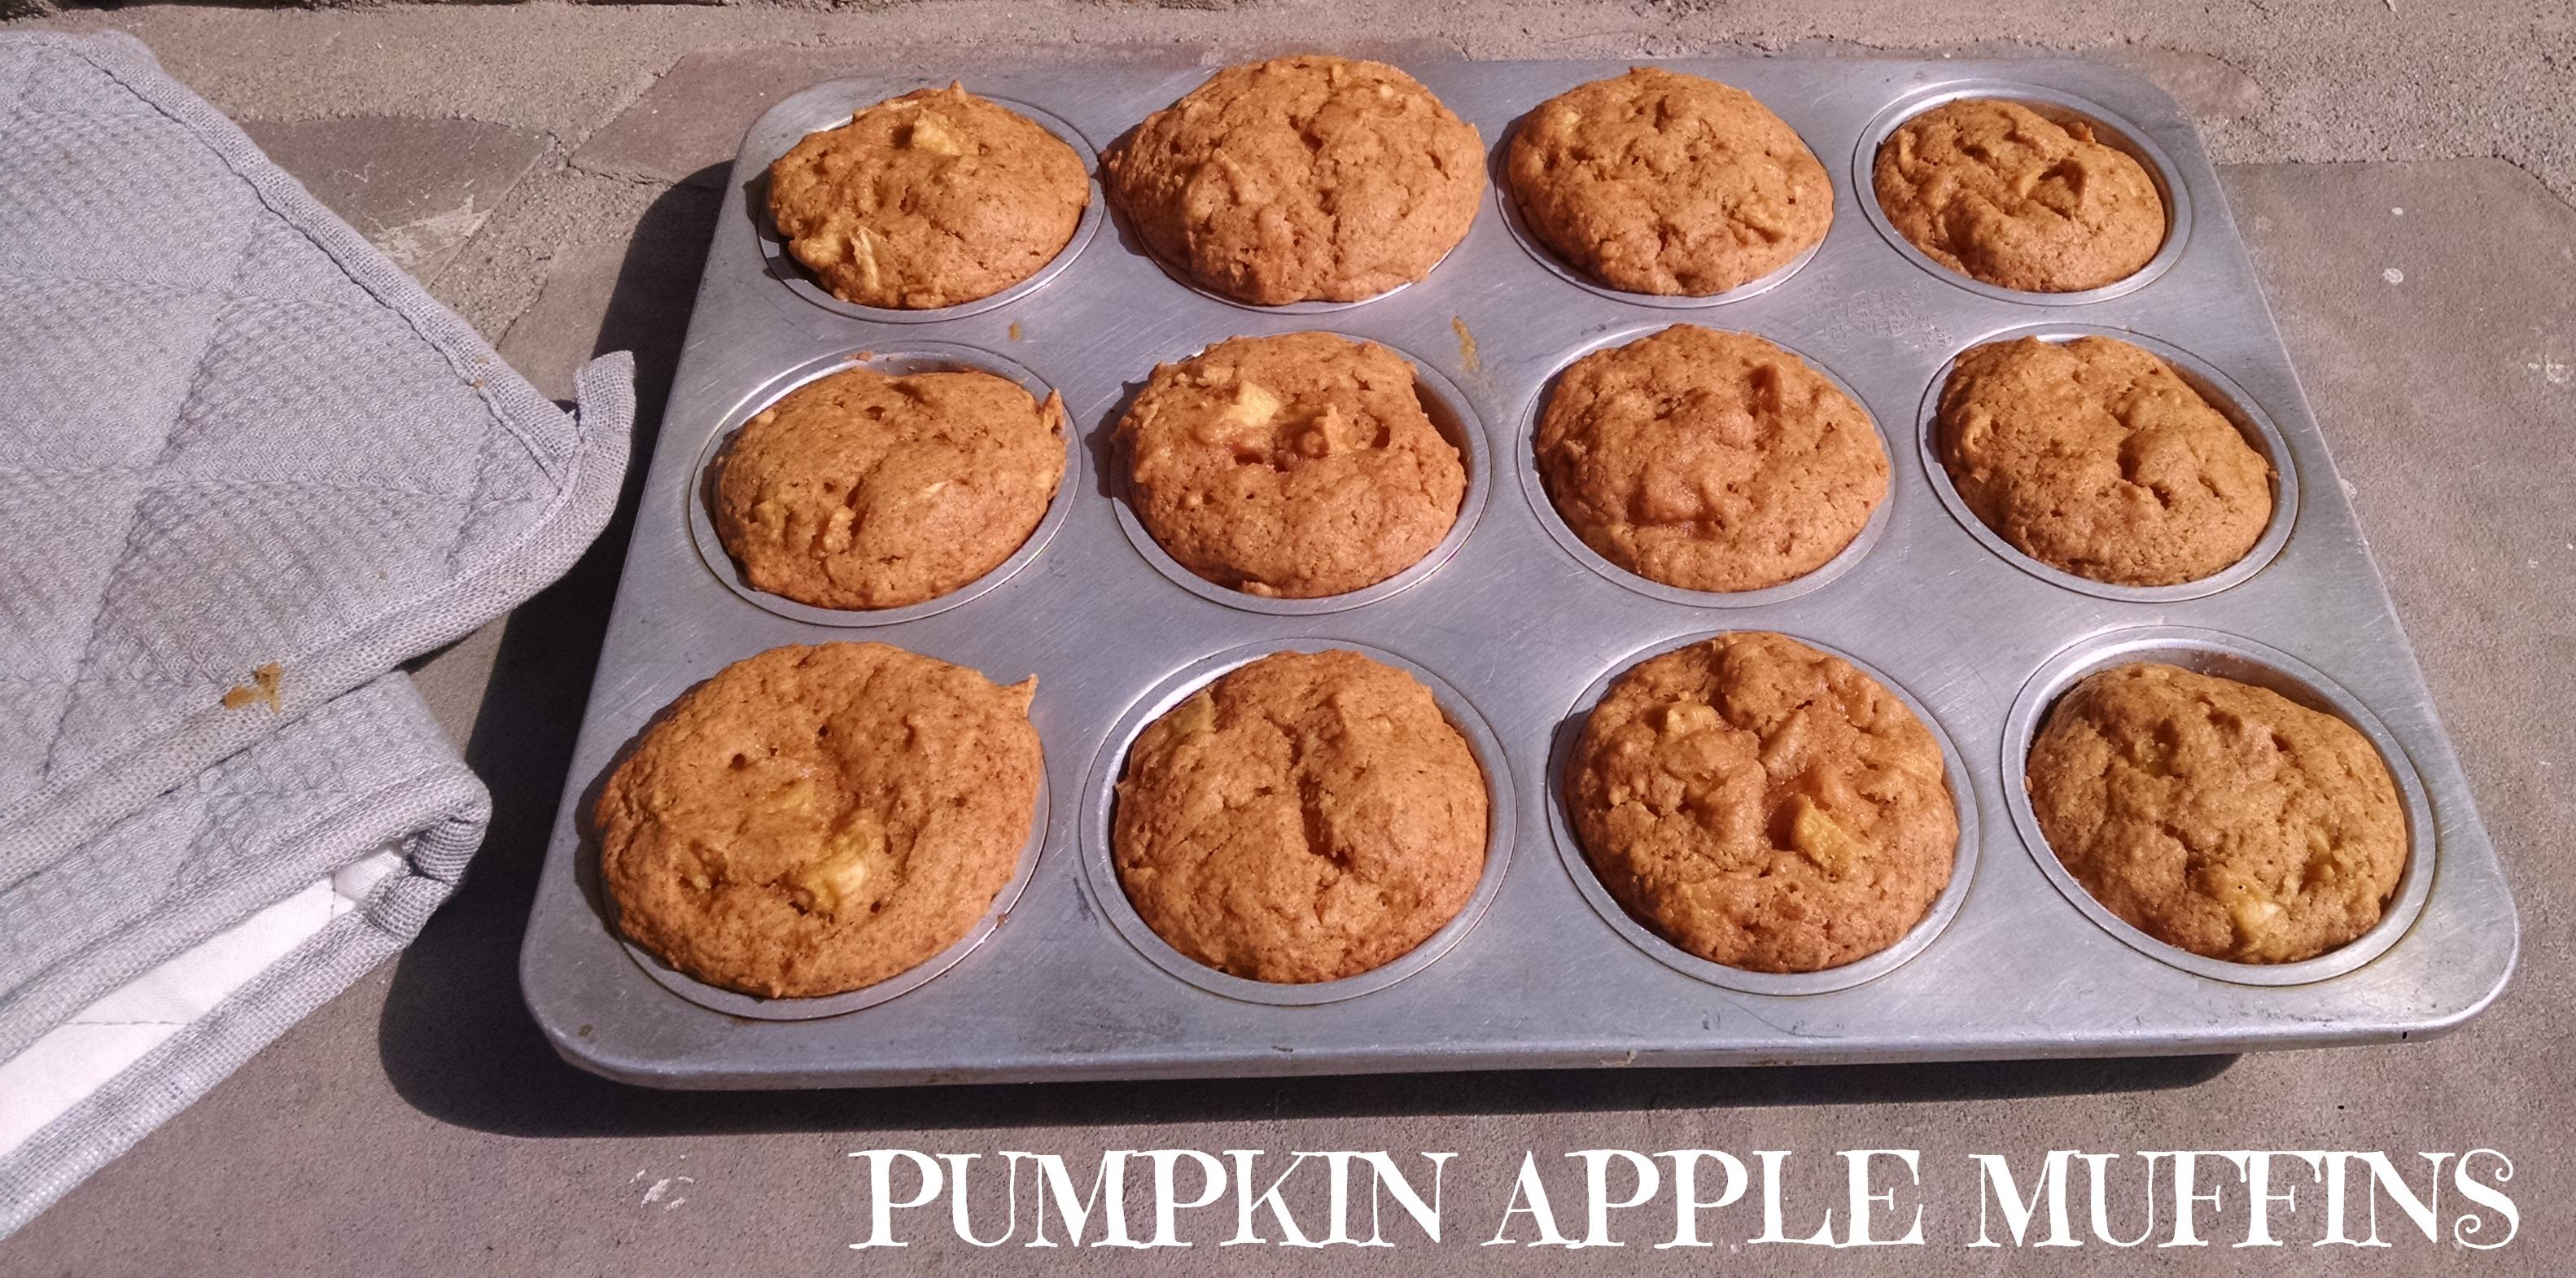 Mojo » Let's Bake: Pumpkin Apple Muffins